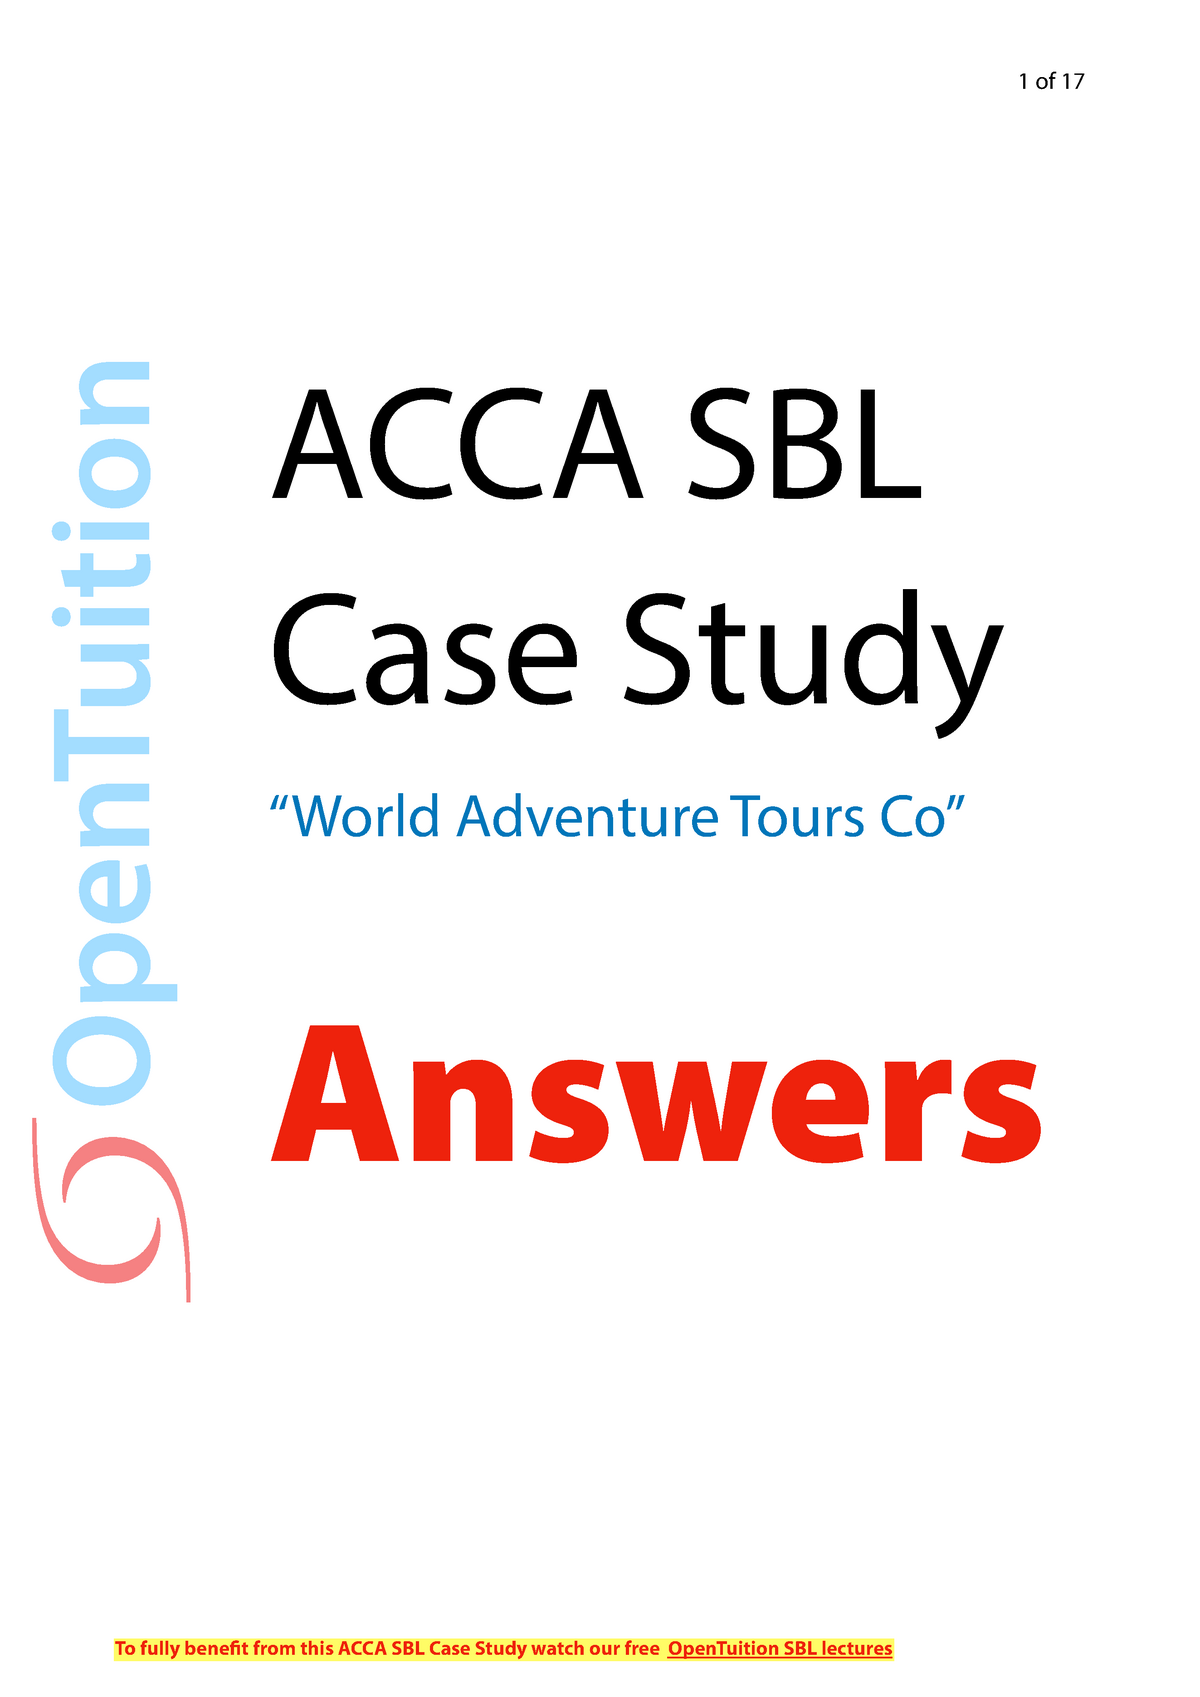 ACCA SBL Case Study World Adventure Tours Co Answers - StuDocu